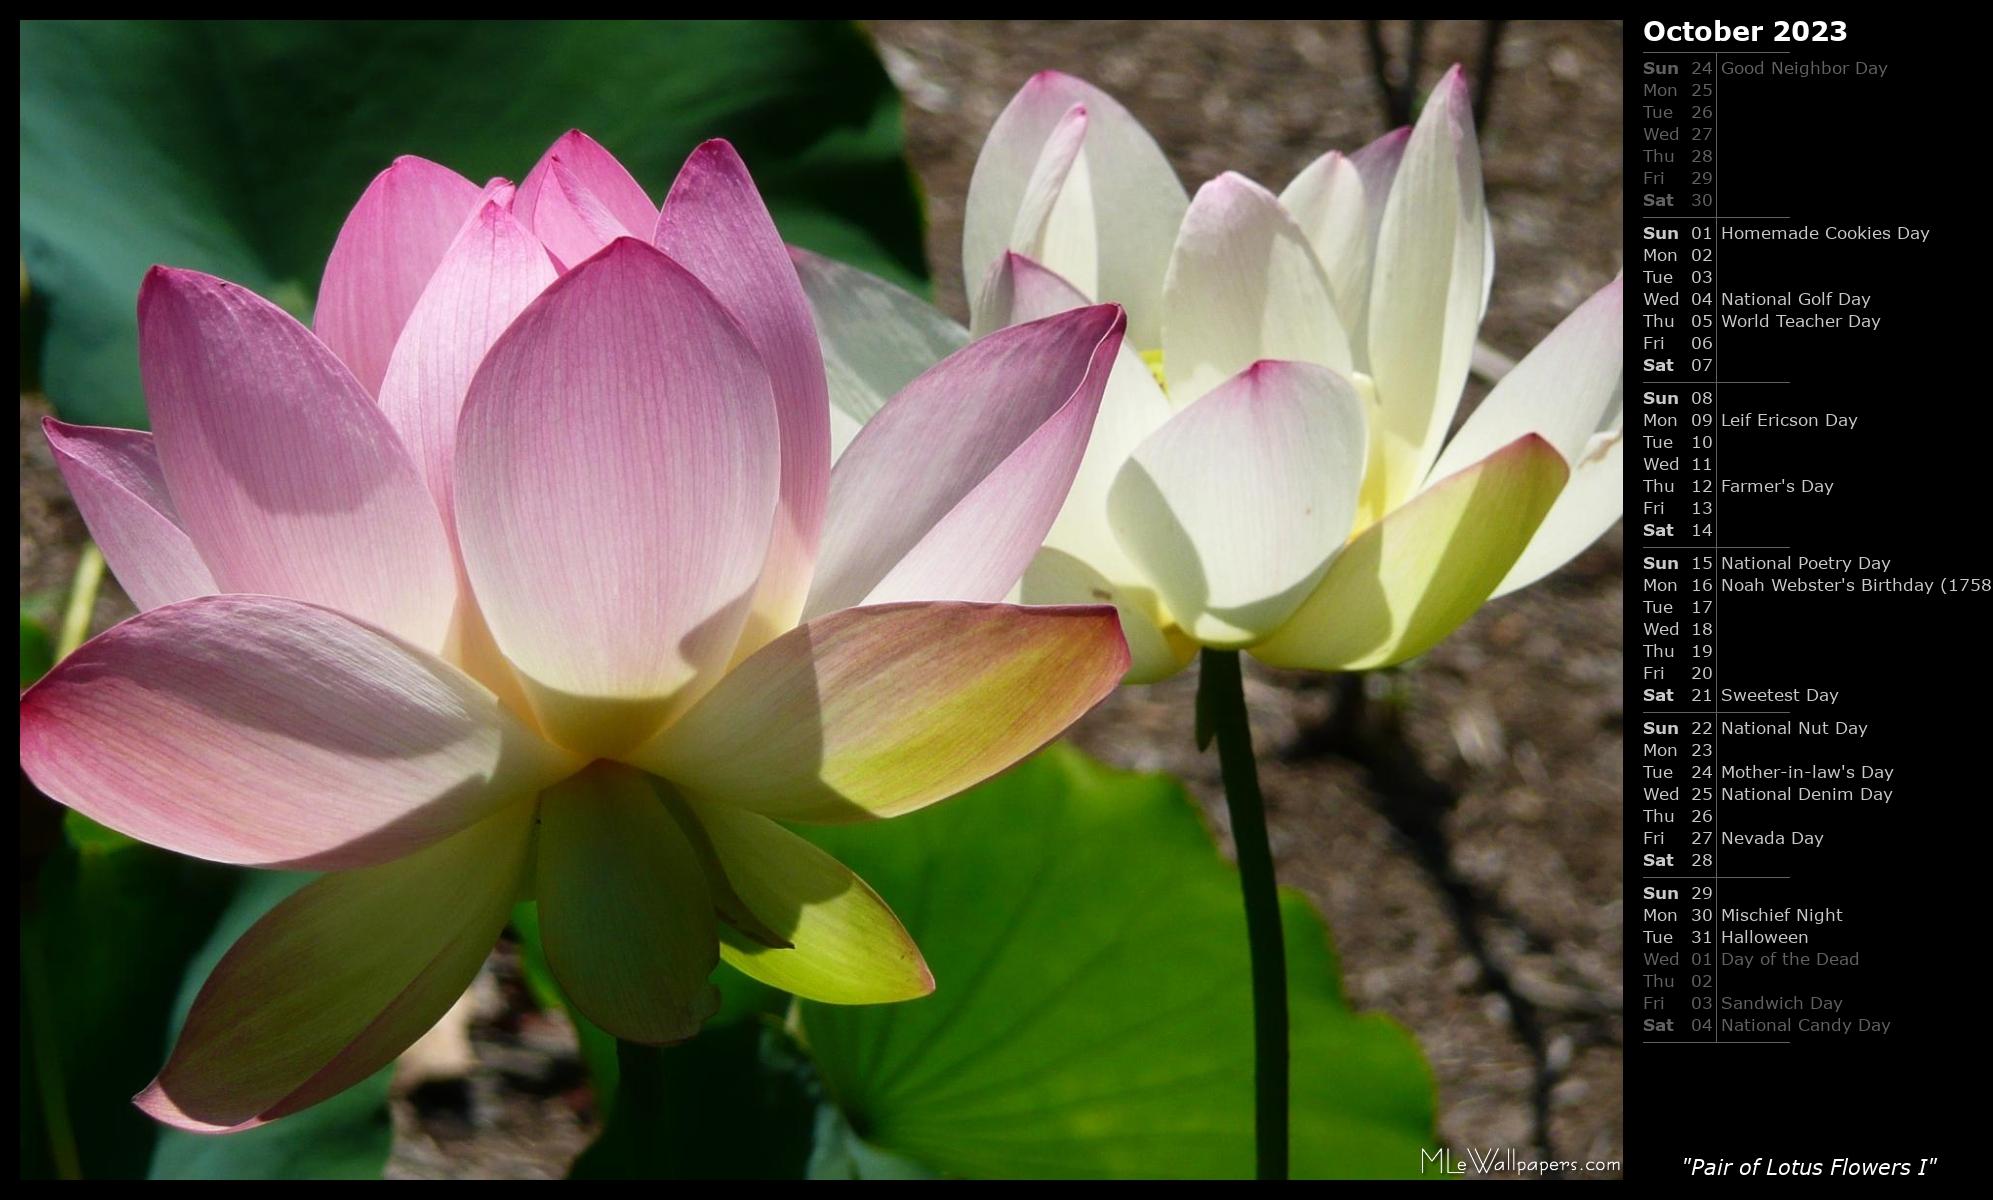 Mlewallpapers Com Pair Of Lotus Flowers I Calendar Images, Photos, Reviews